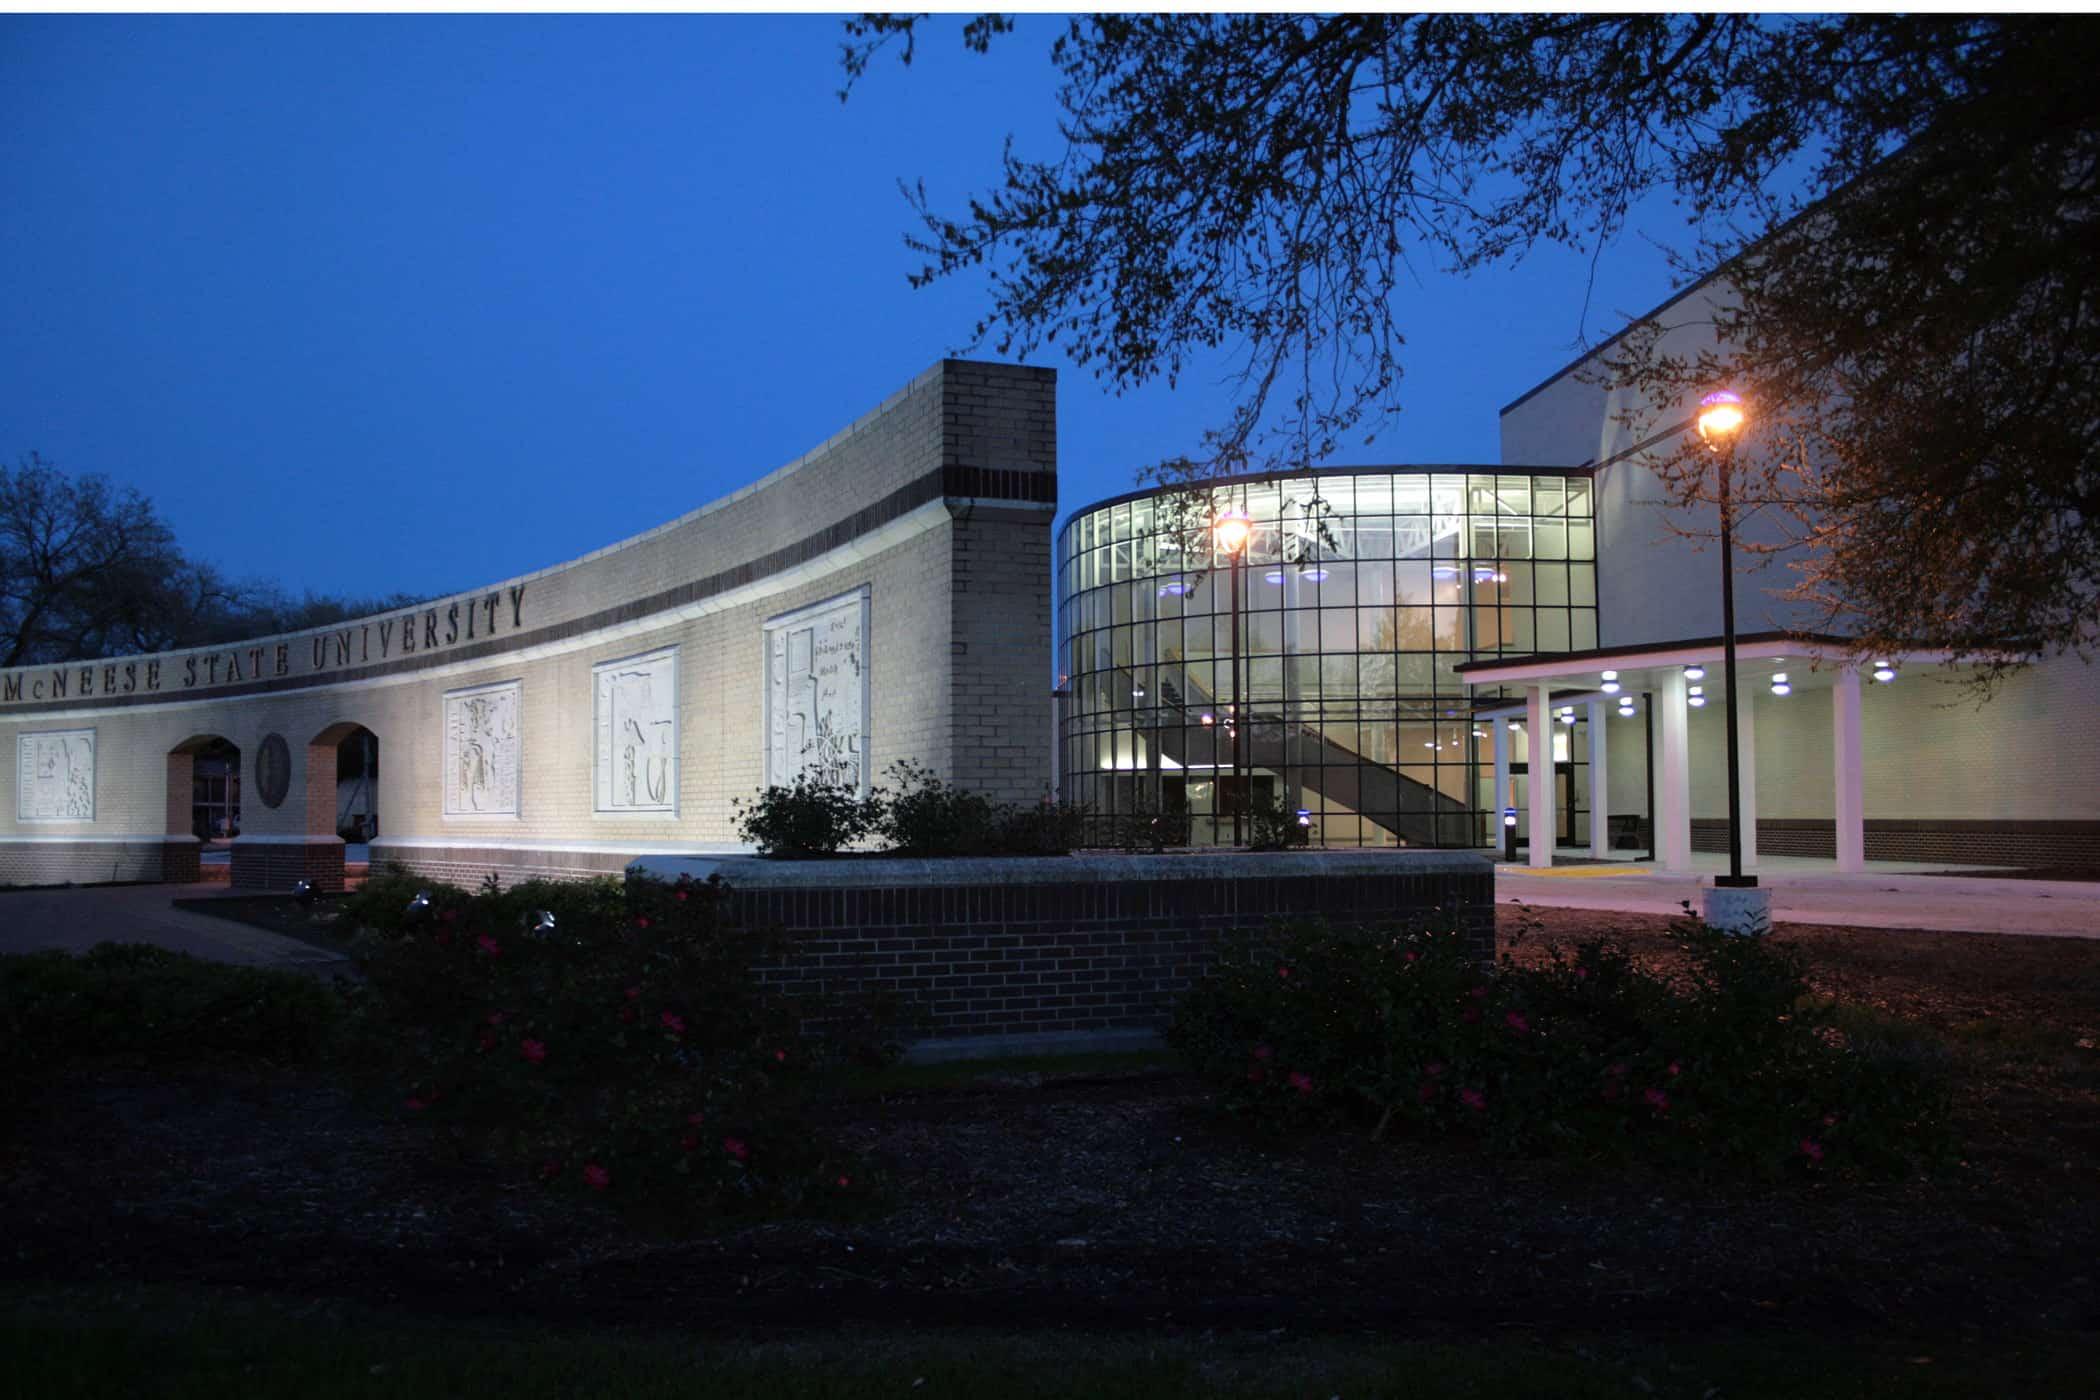 Best_Colleges_Universities_Louisiana_McNeese_State_University